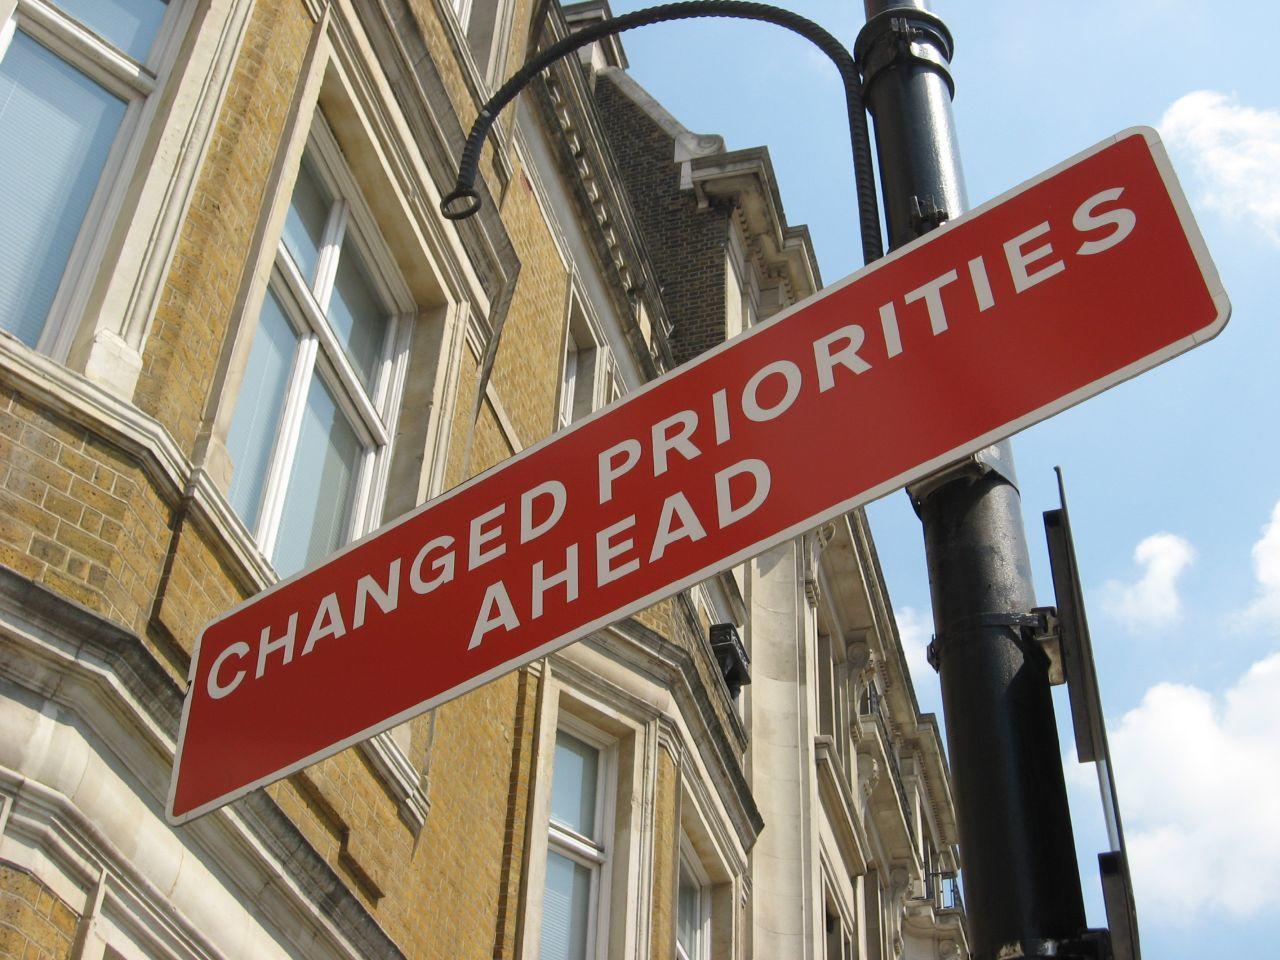 set financial priorities